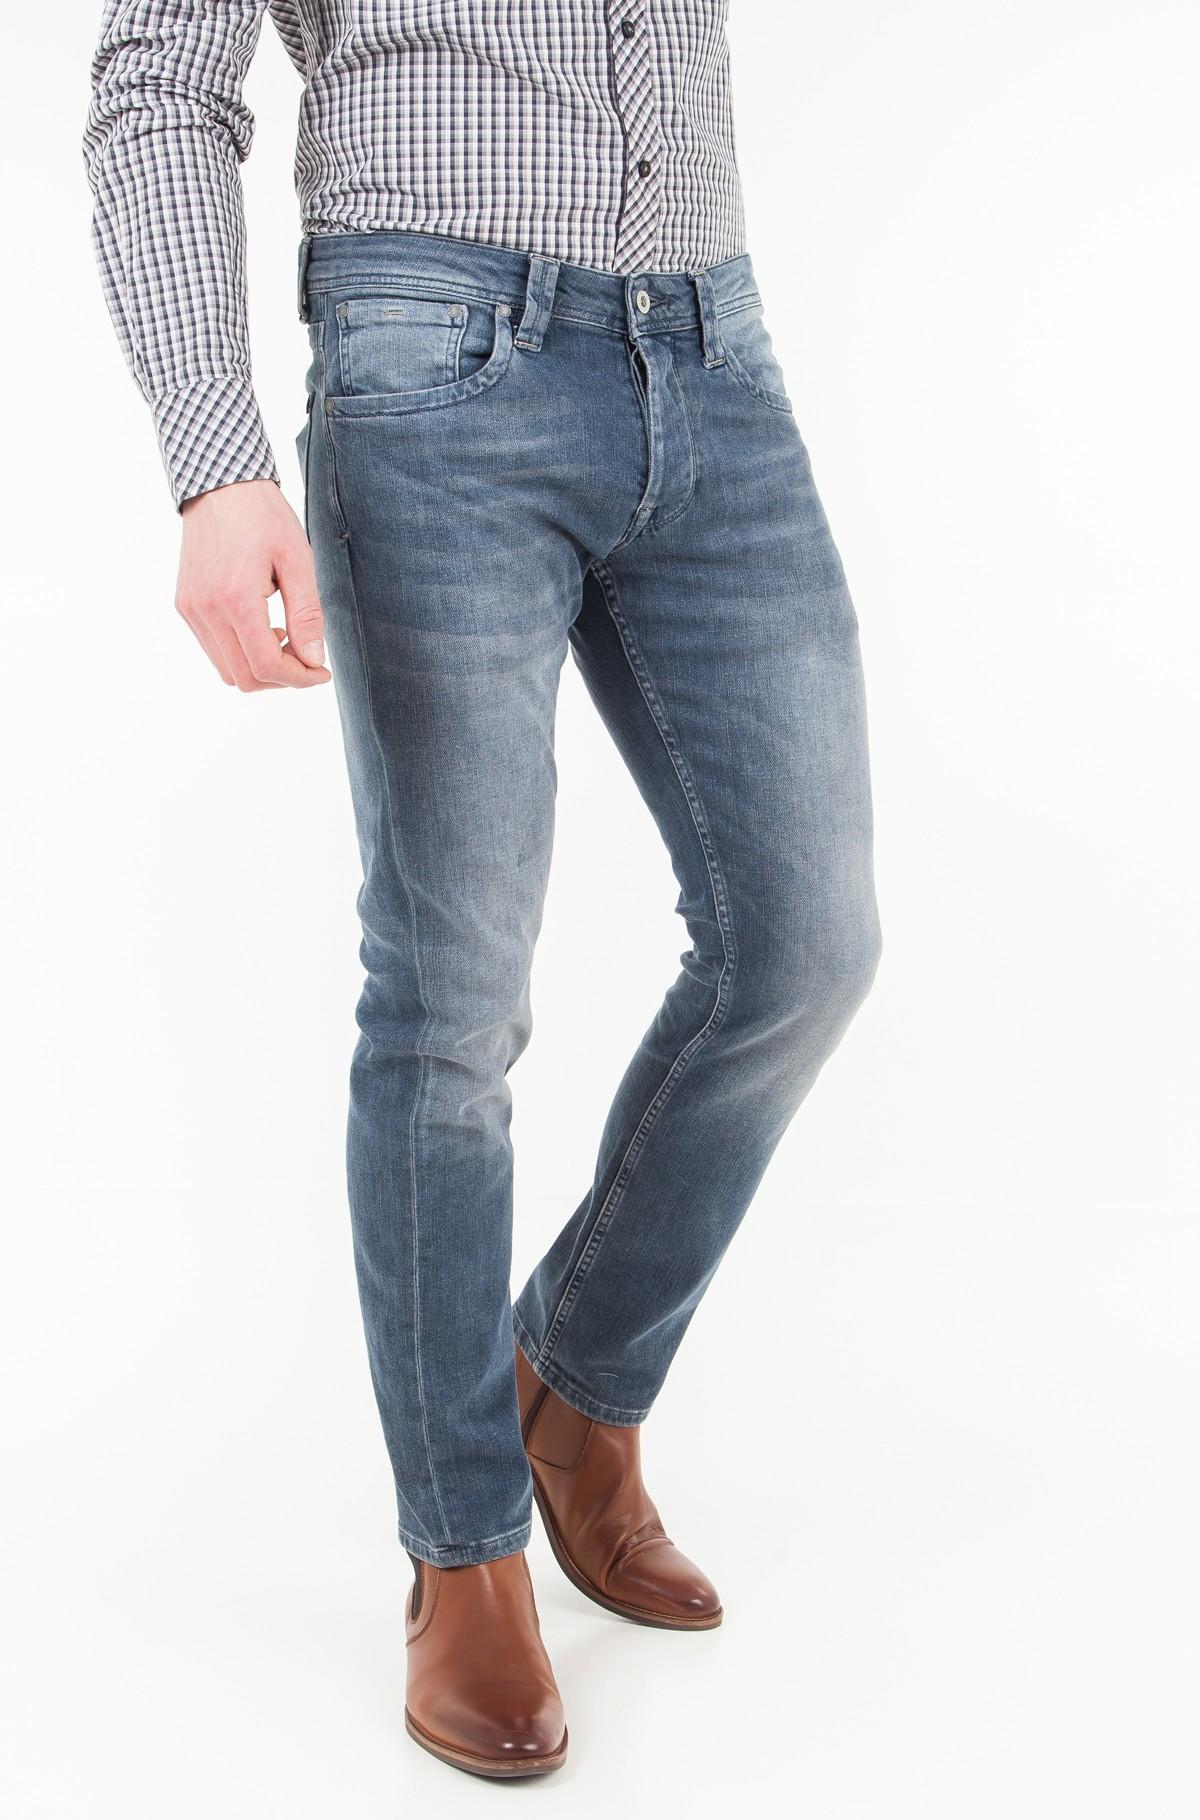 Jeans Cash/PM200124GD7-full-1